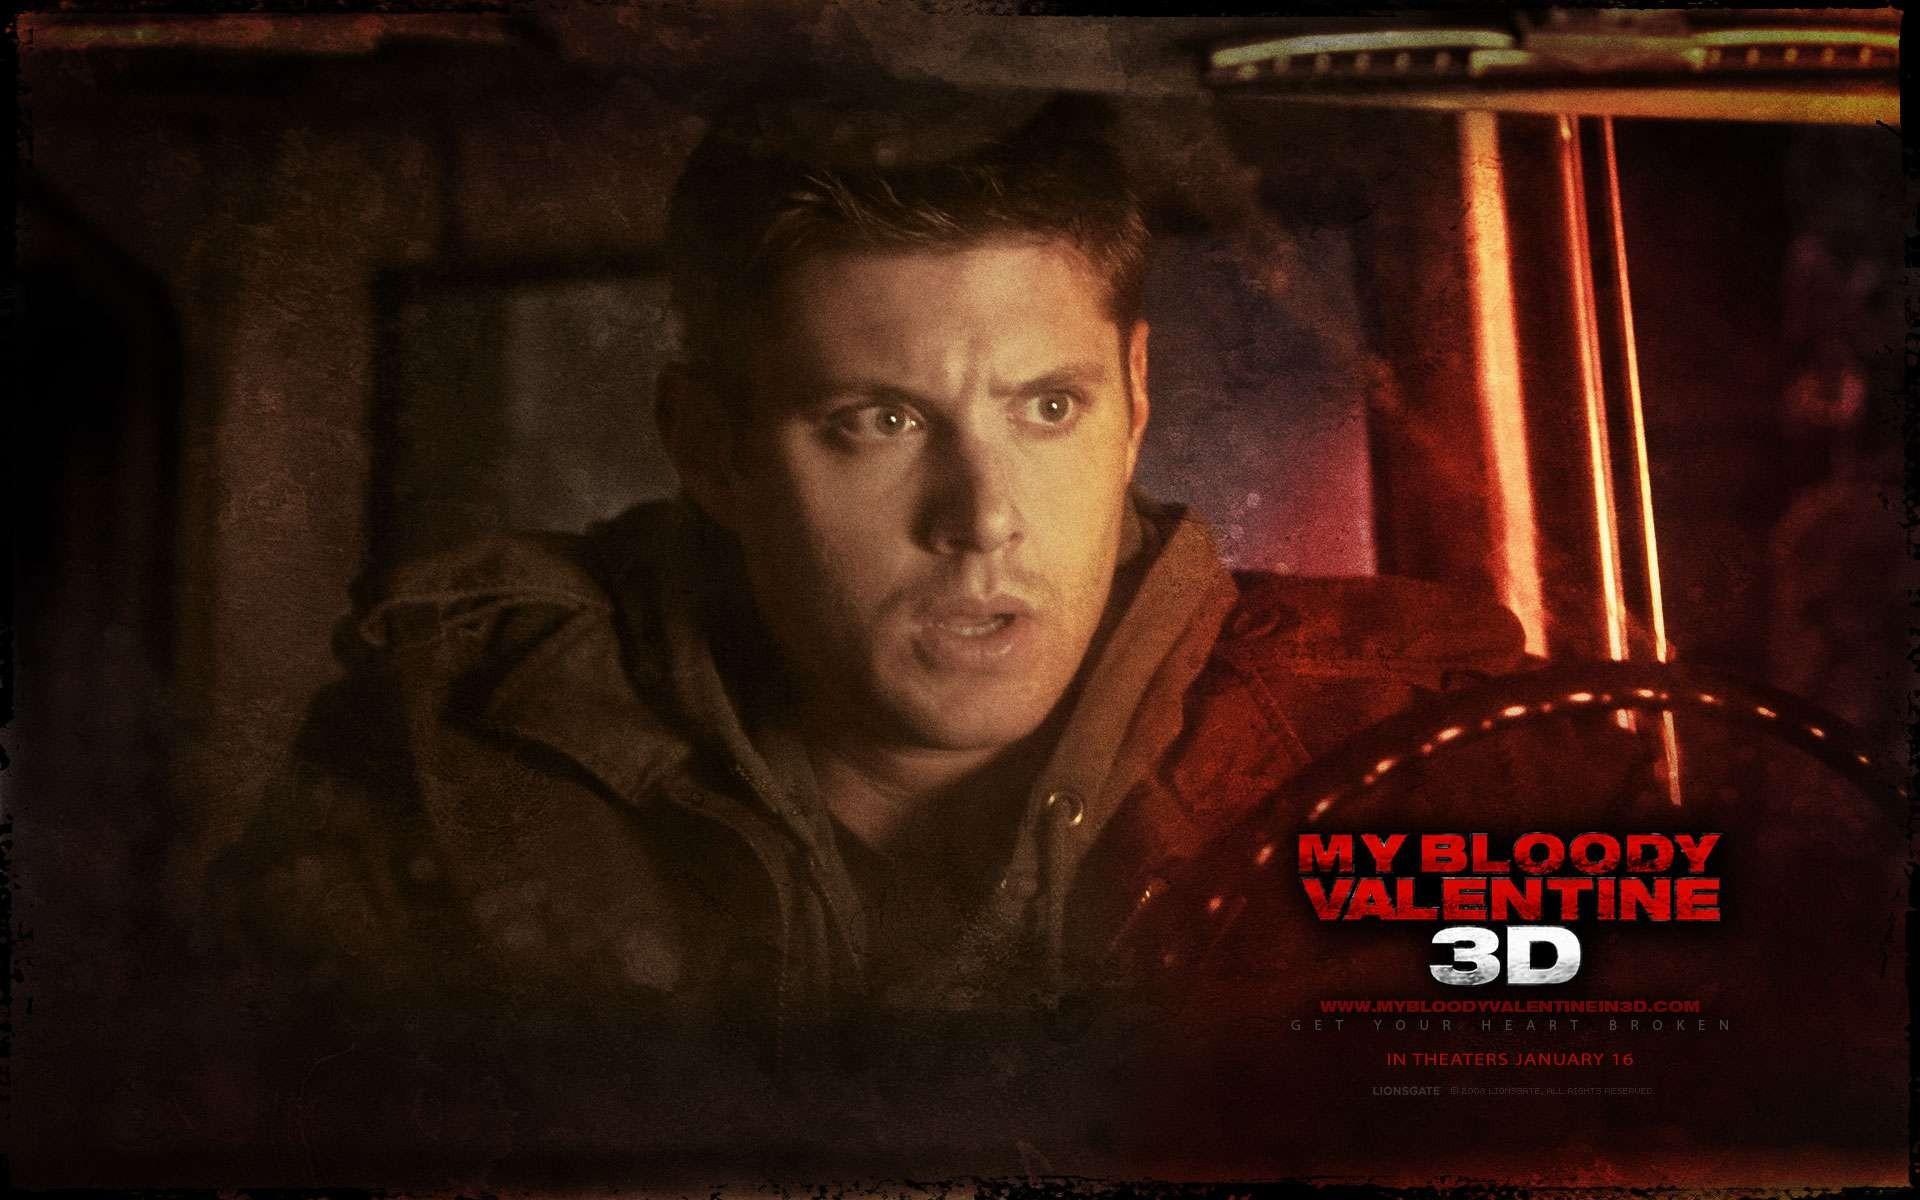 Un wallpaper del film My Bloody Valentine 3D con Jensen Ackles